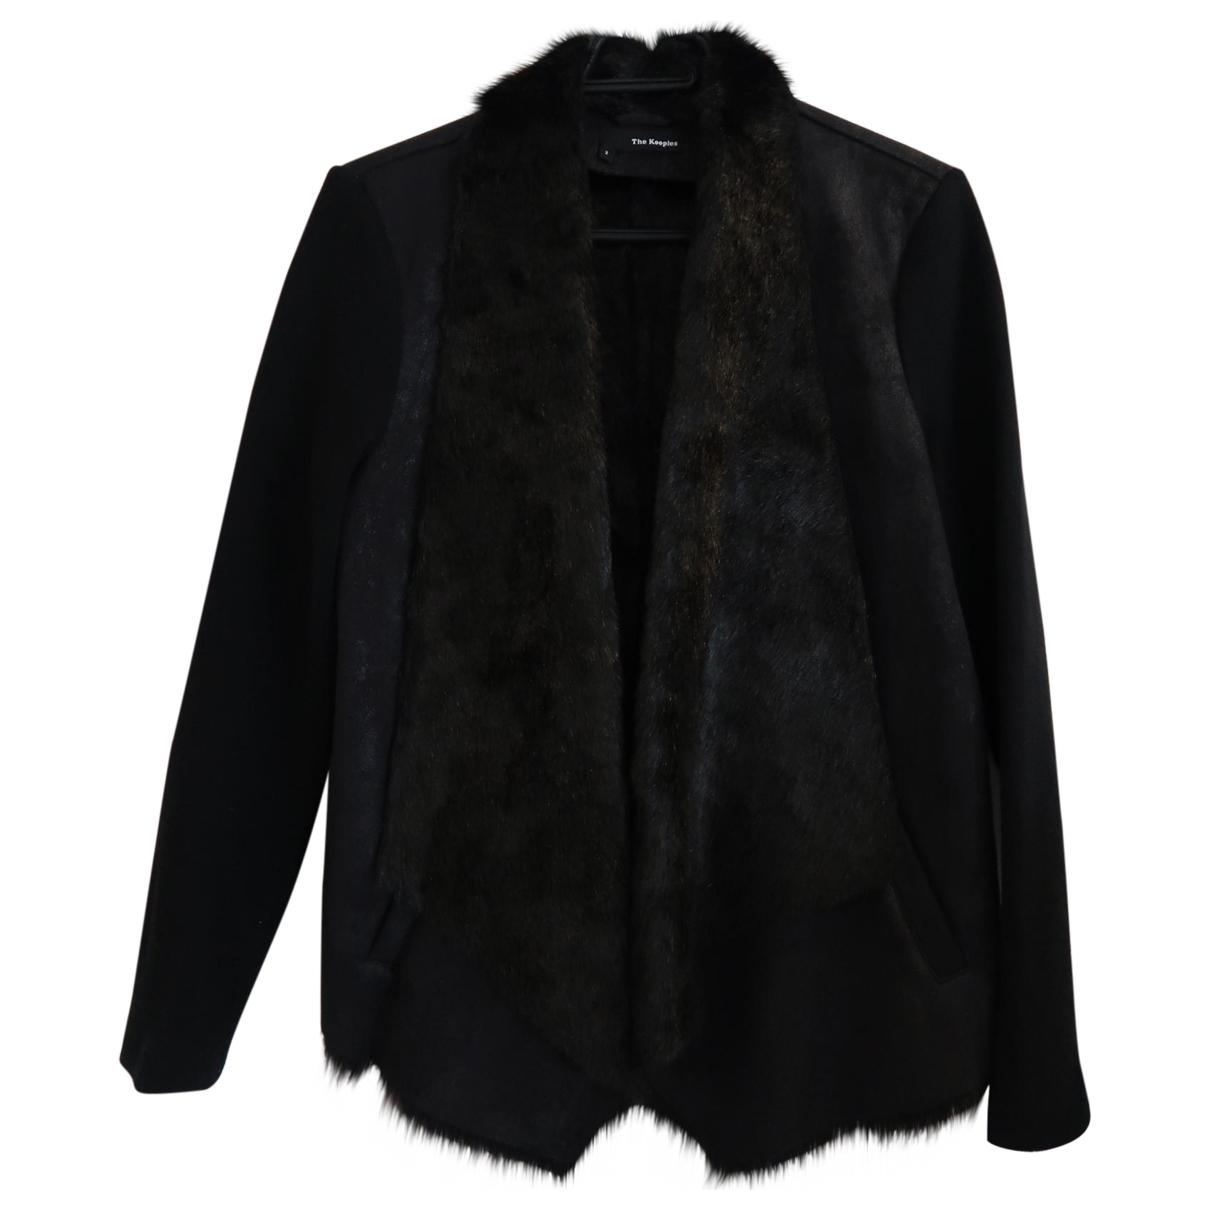 The Kooples \N Black Leather jacket for Women 2 0-5